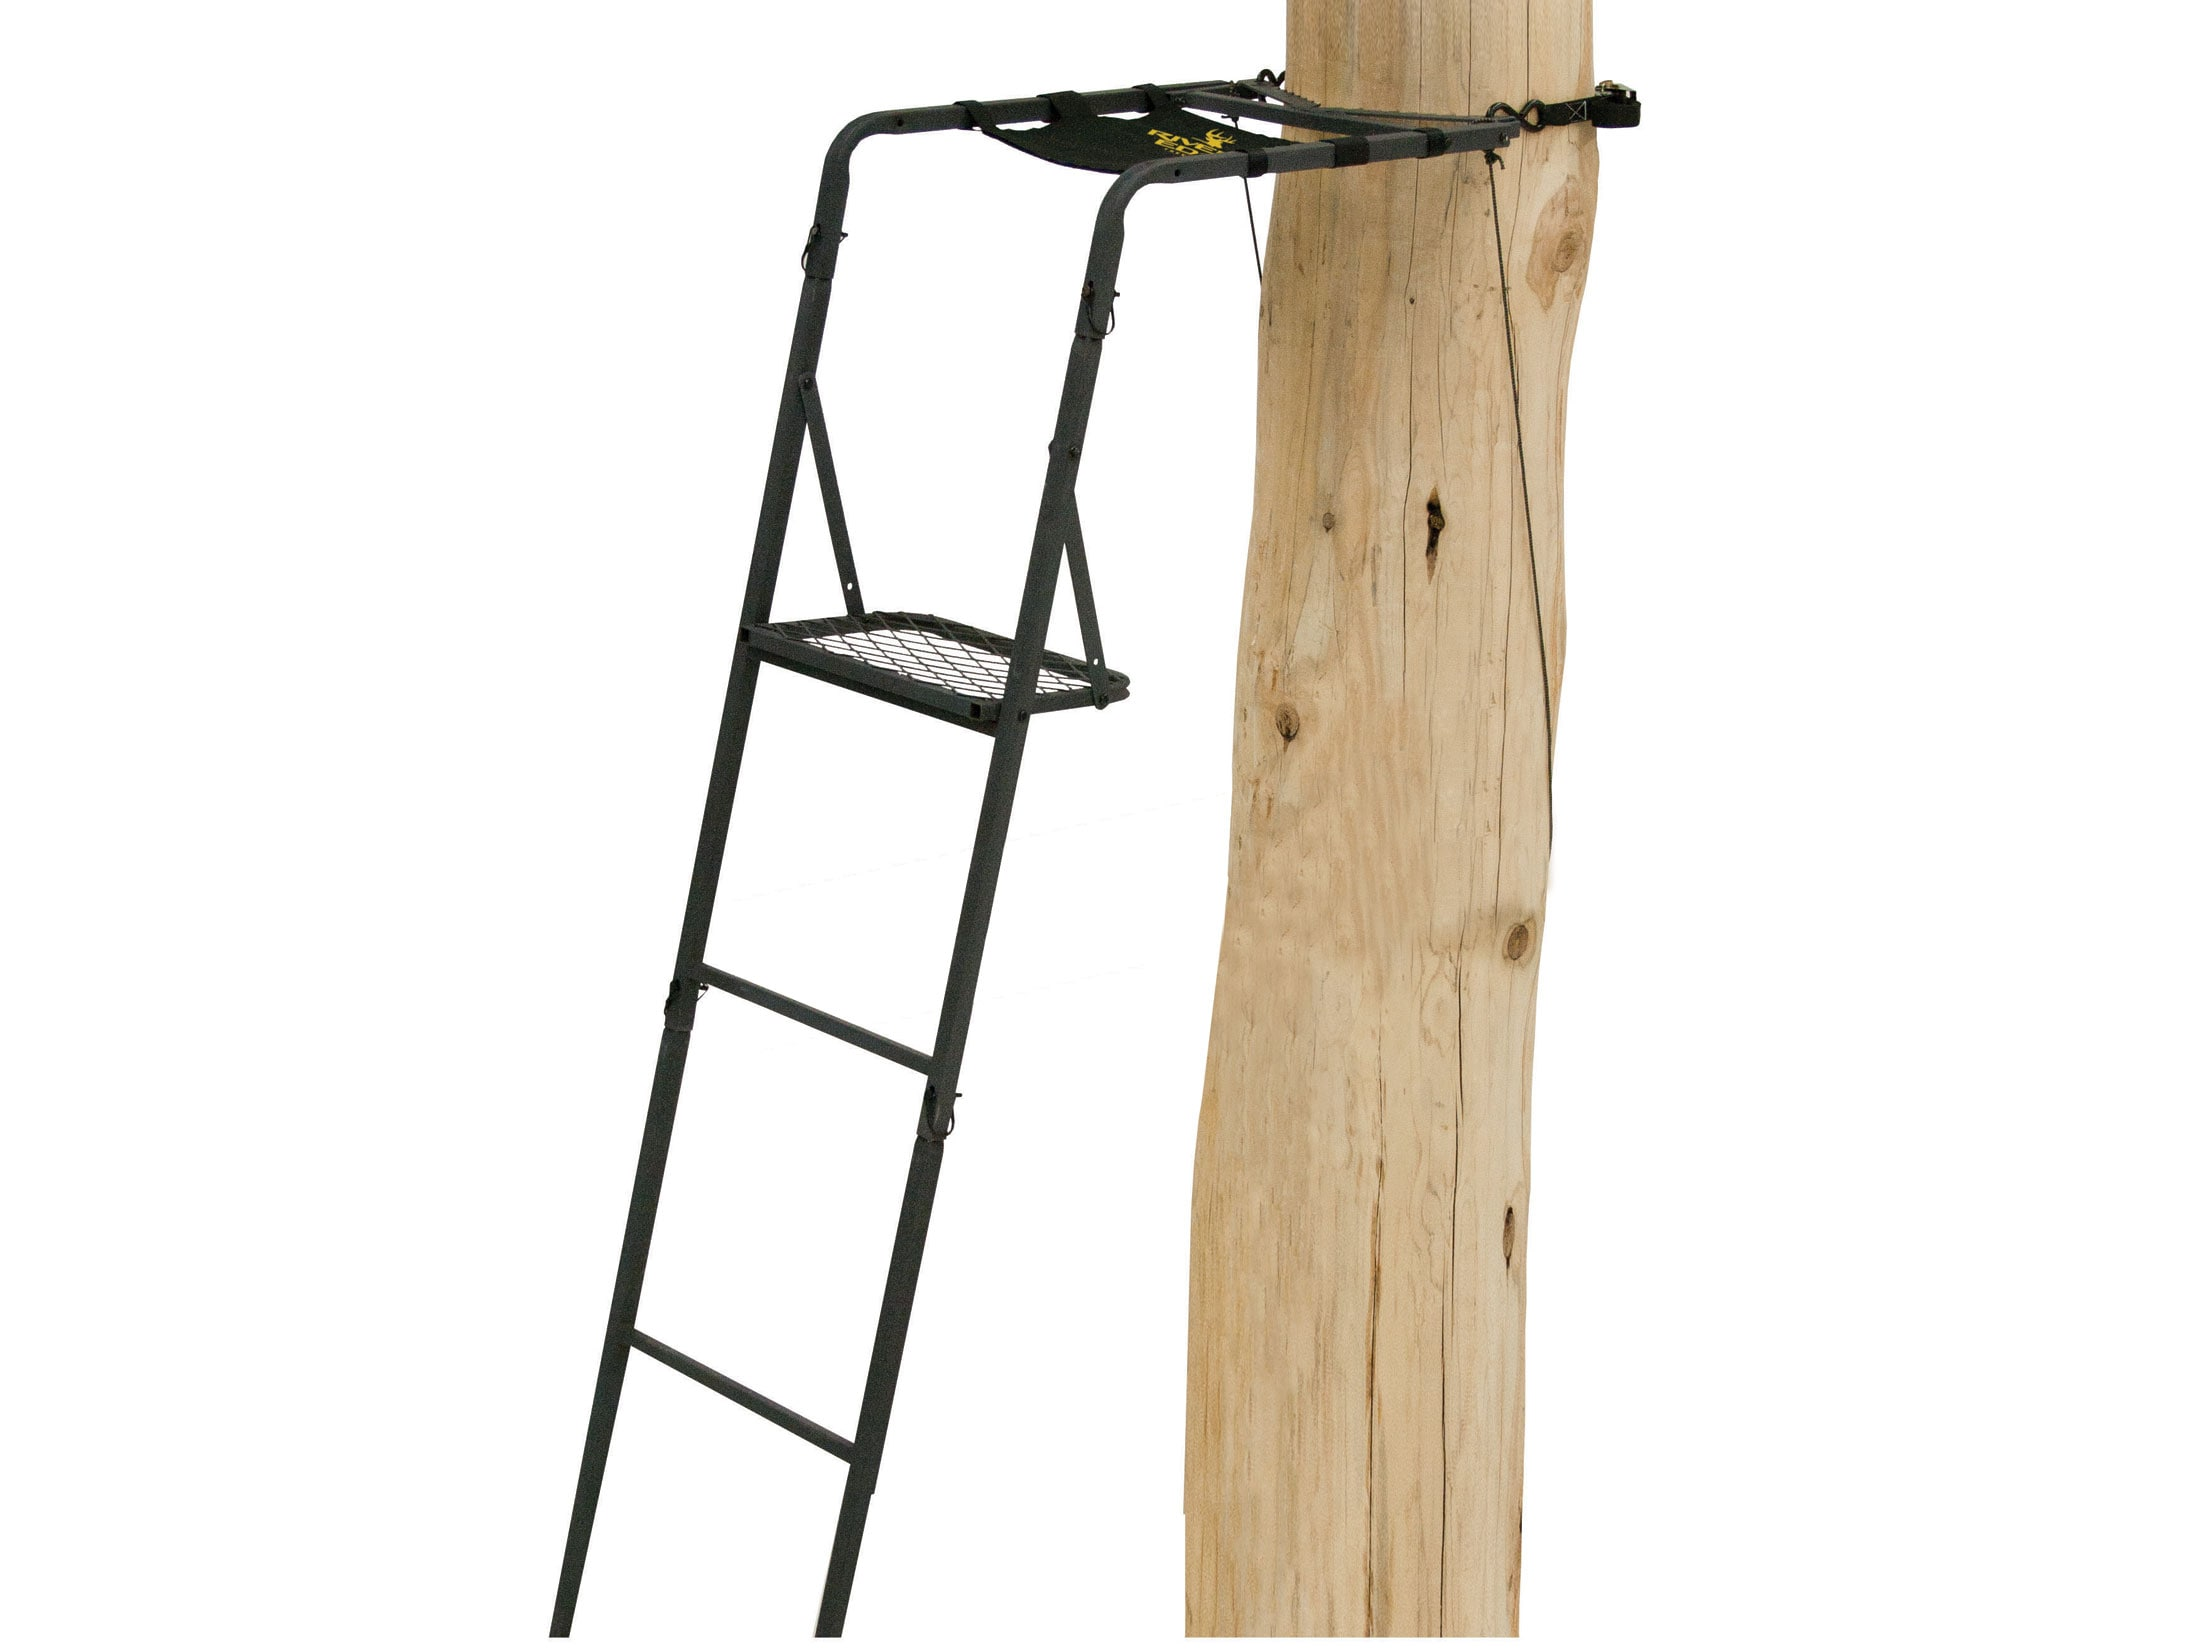 Rivers Edge Pack N Stack Single Ladder Treestand Steel